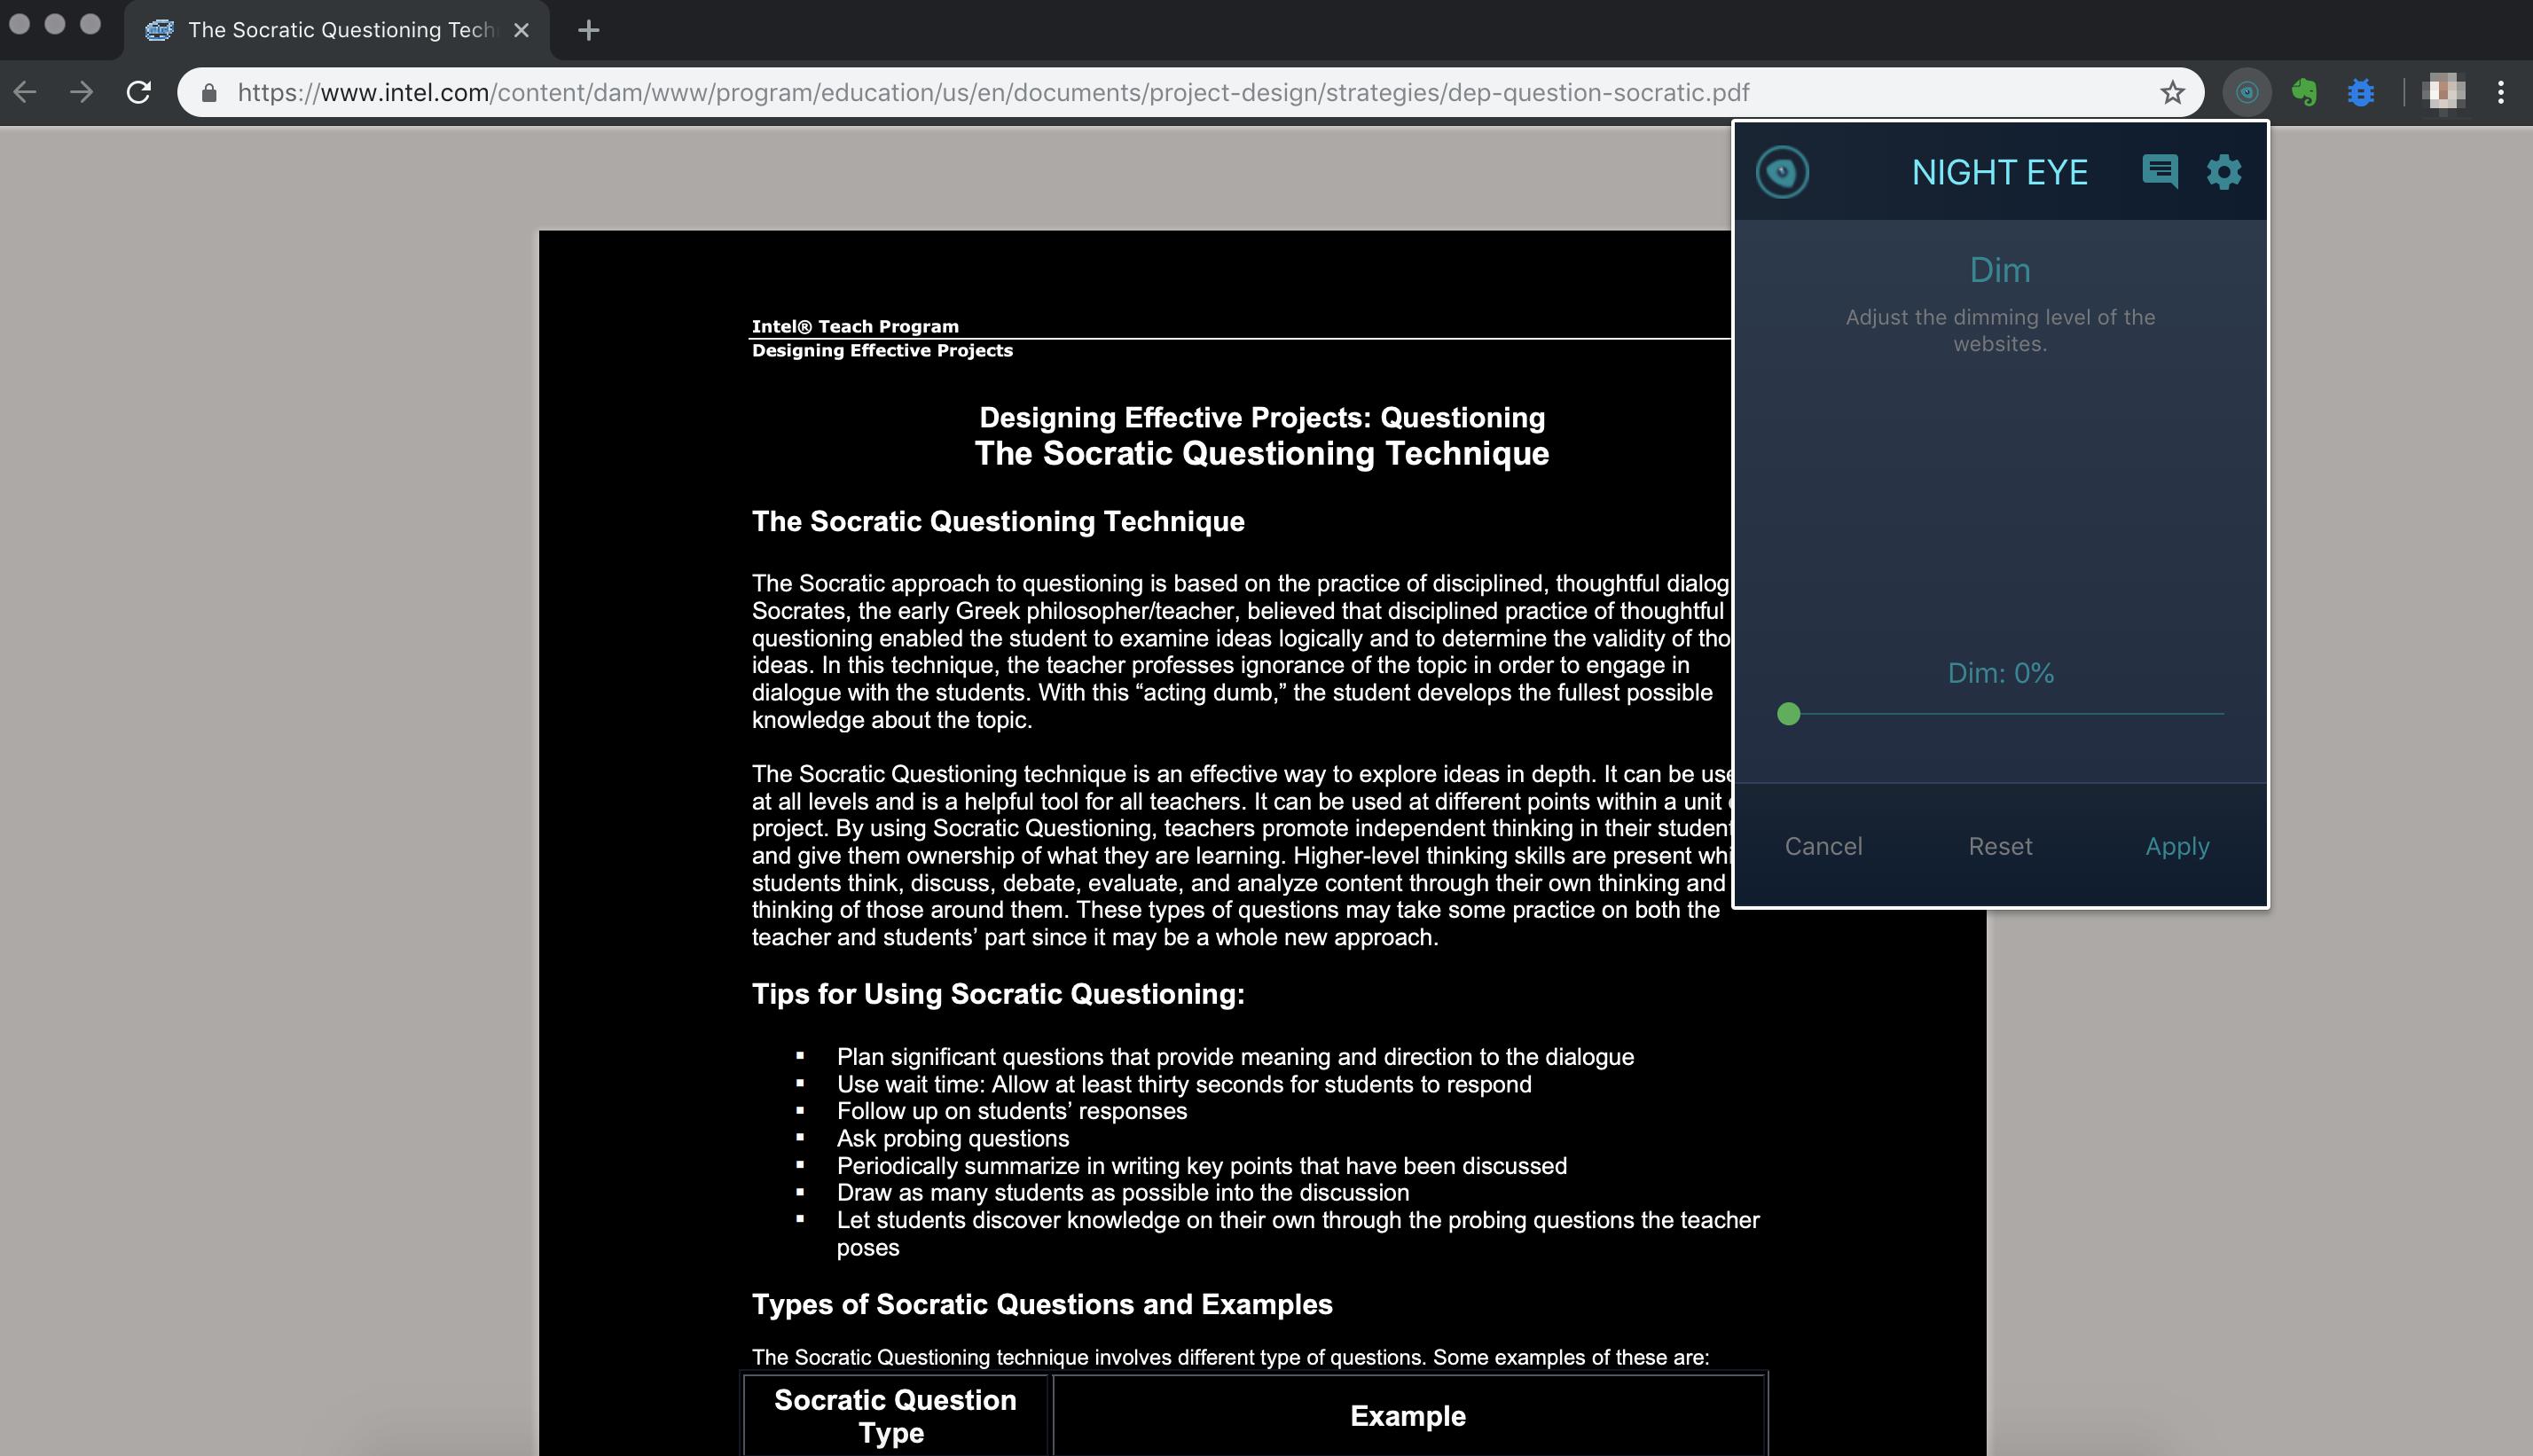 pdf-dark-mode-without-filtering